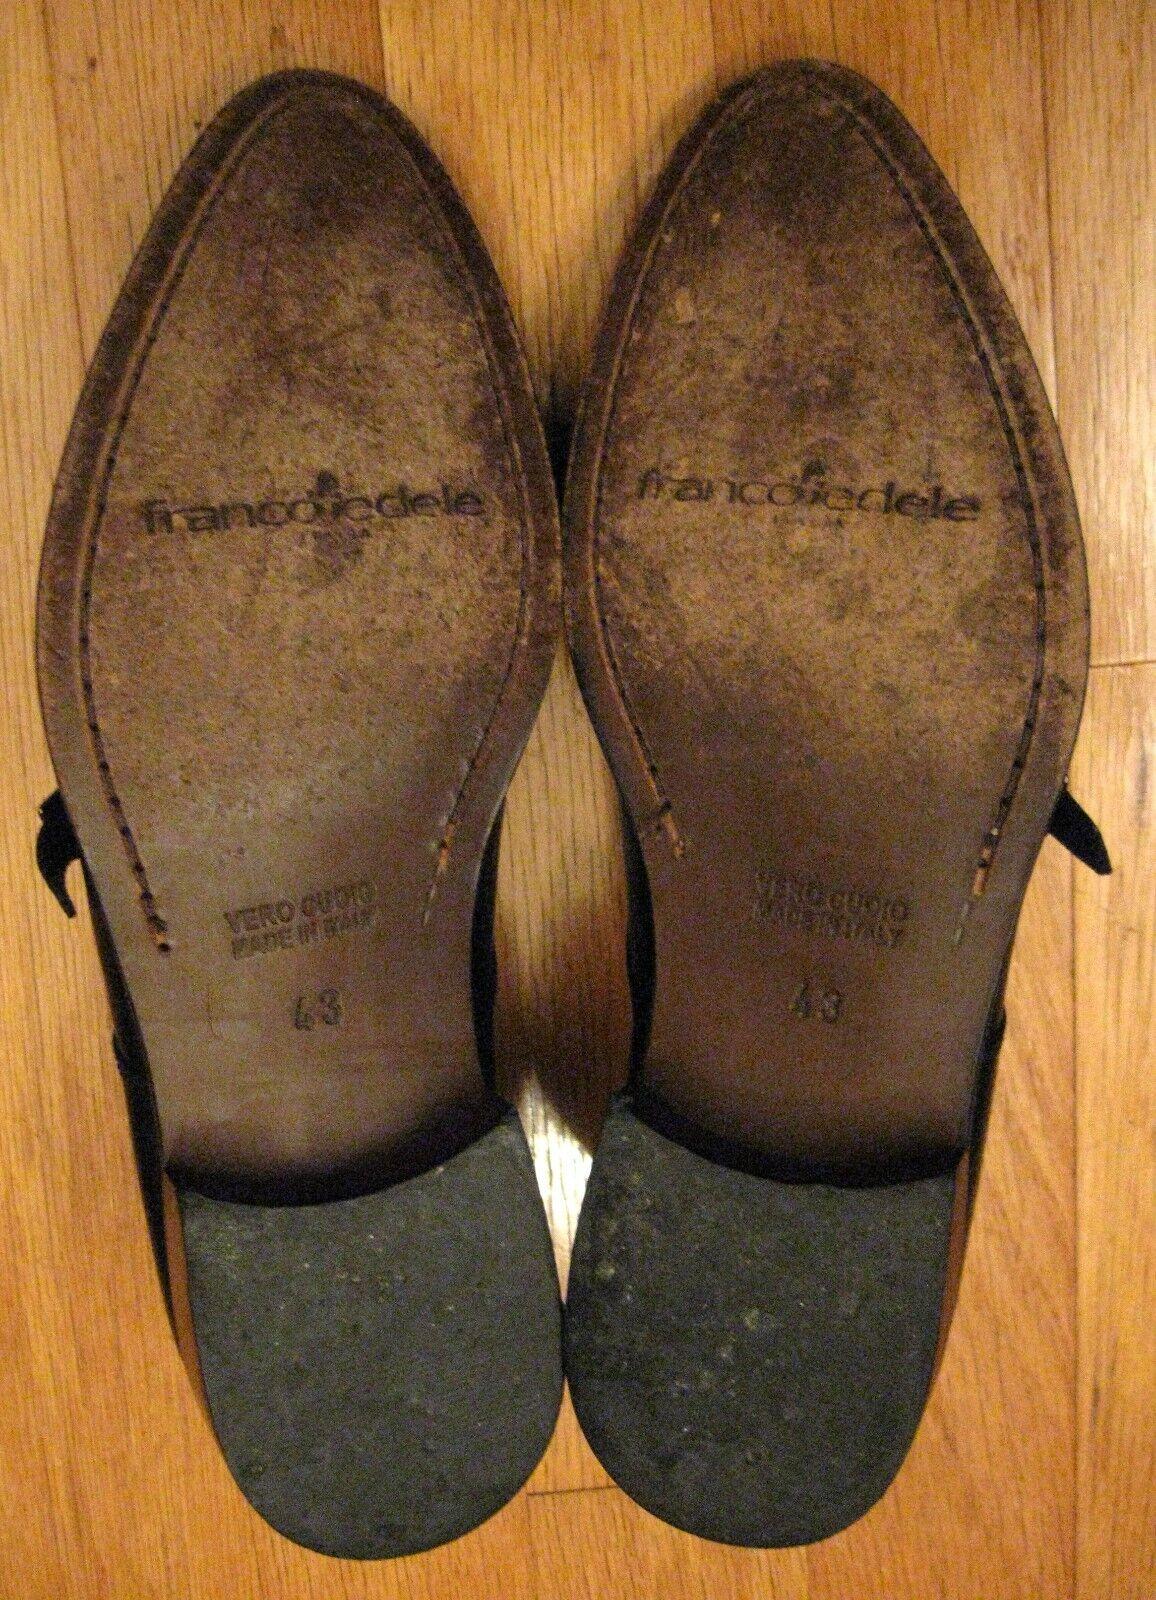 FRANCO FEDELE ITALIA herren schwarz LEATHER DOUBLE MONK DRESS schuhe schuhe schuhe Größe 43 e85a32